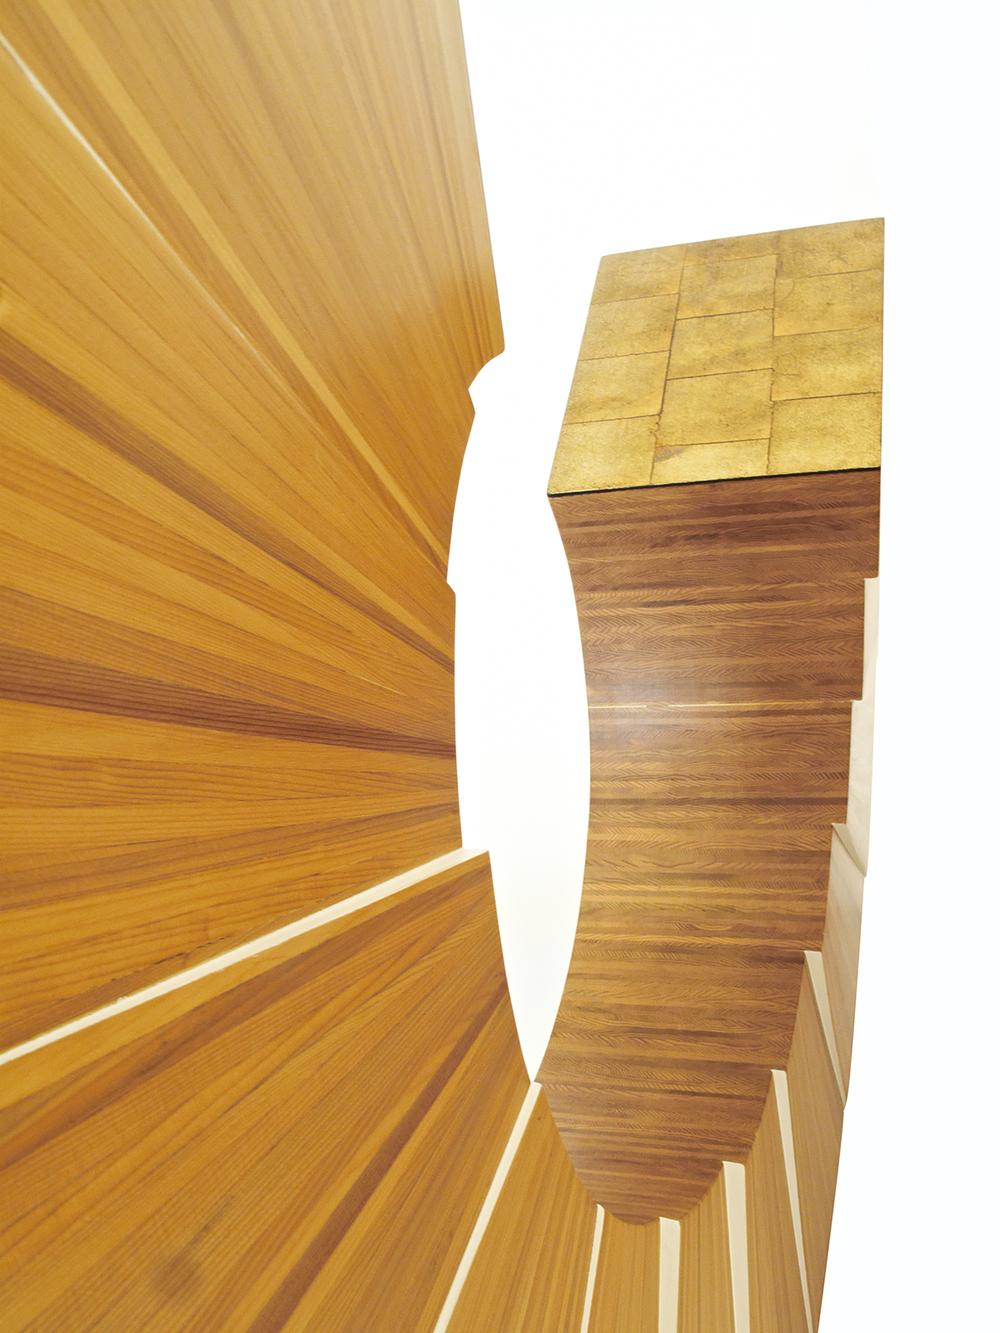 Arched Cedar by Jacob Kulin